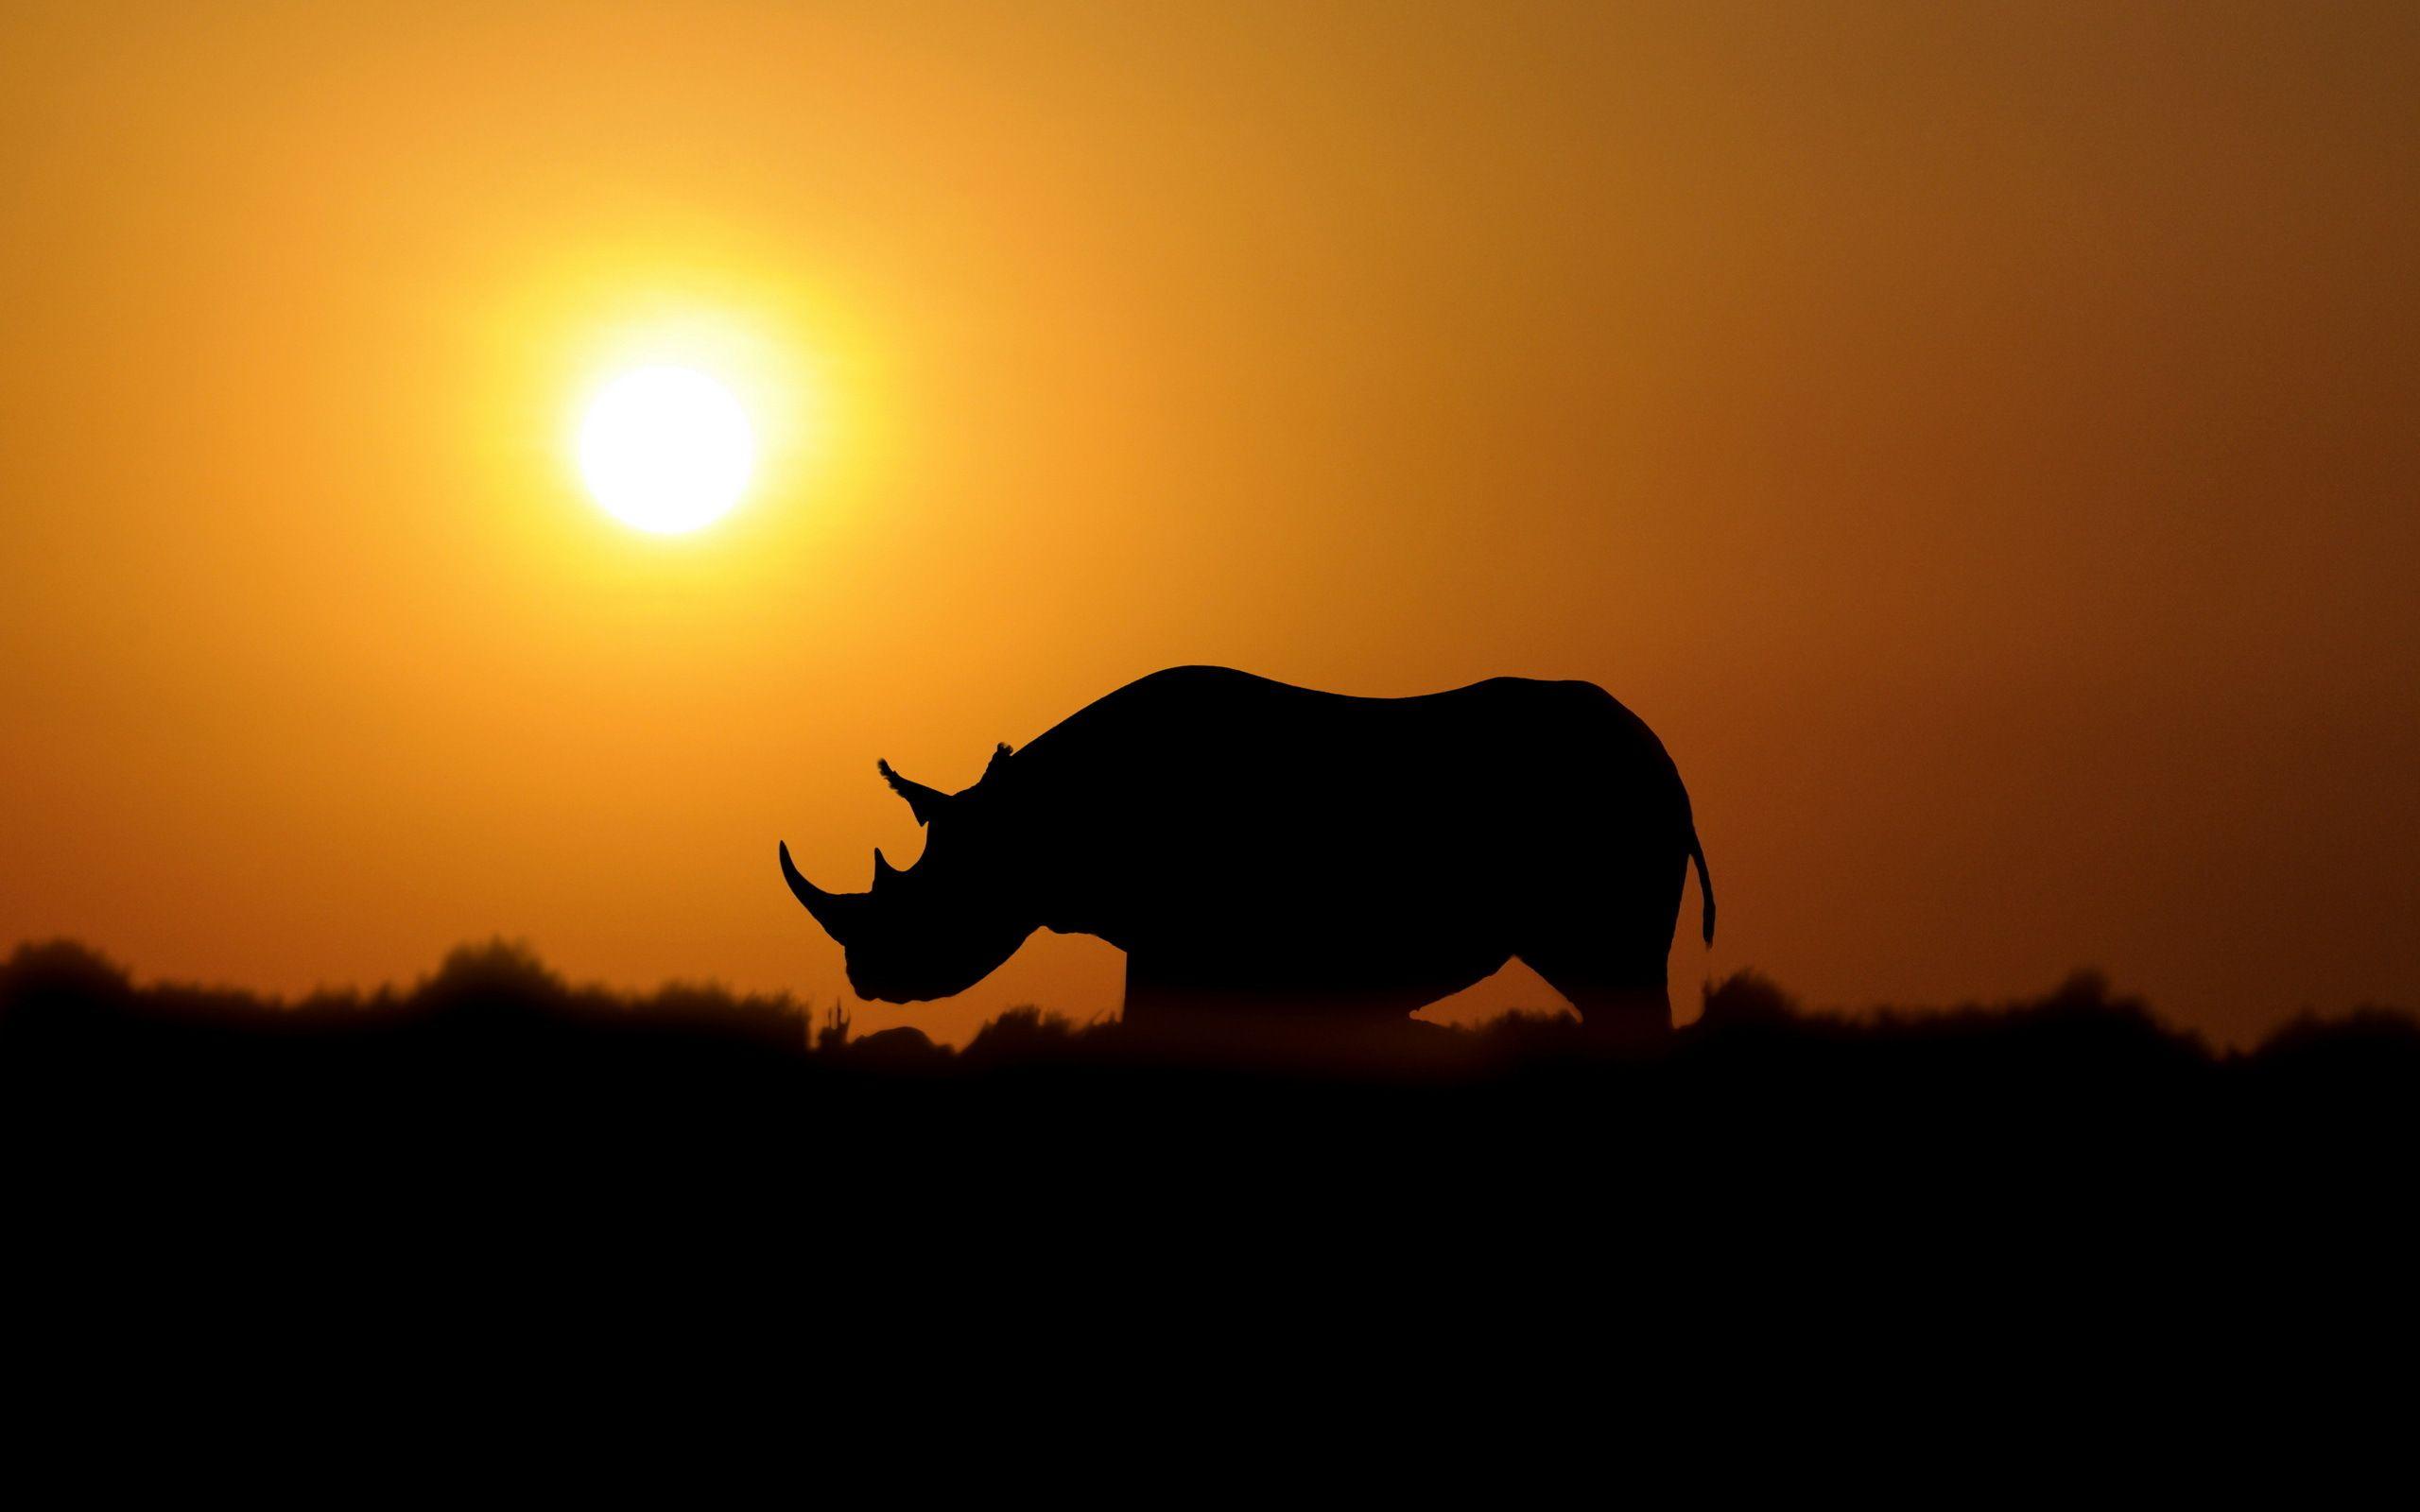 utv desktop wallpaper images - yamaha rhino forum - rhino forums